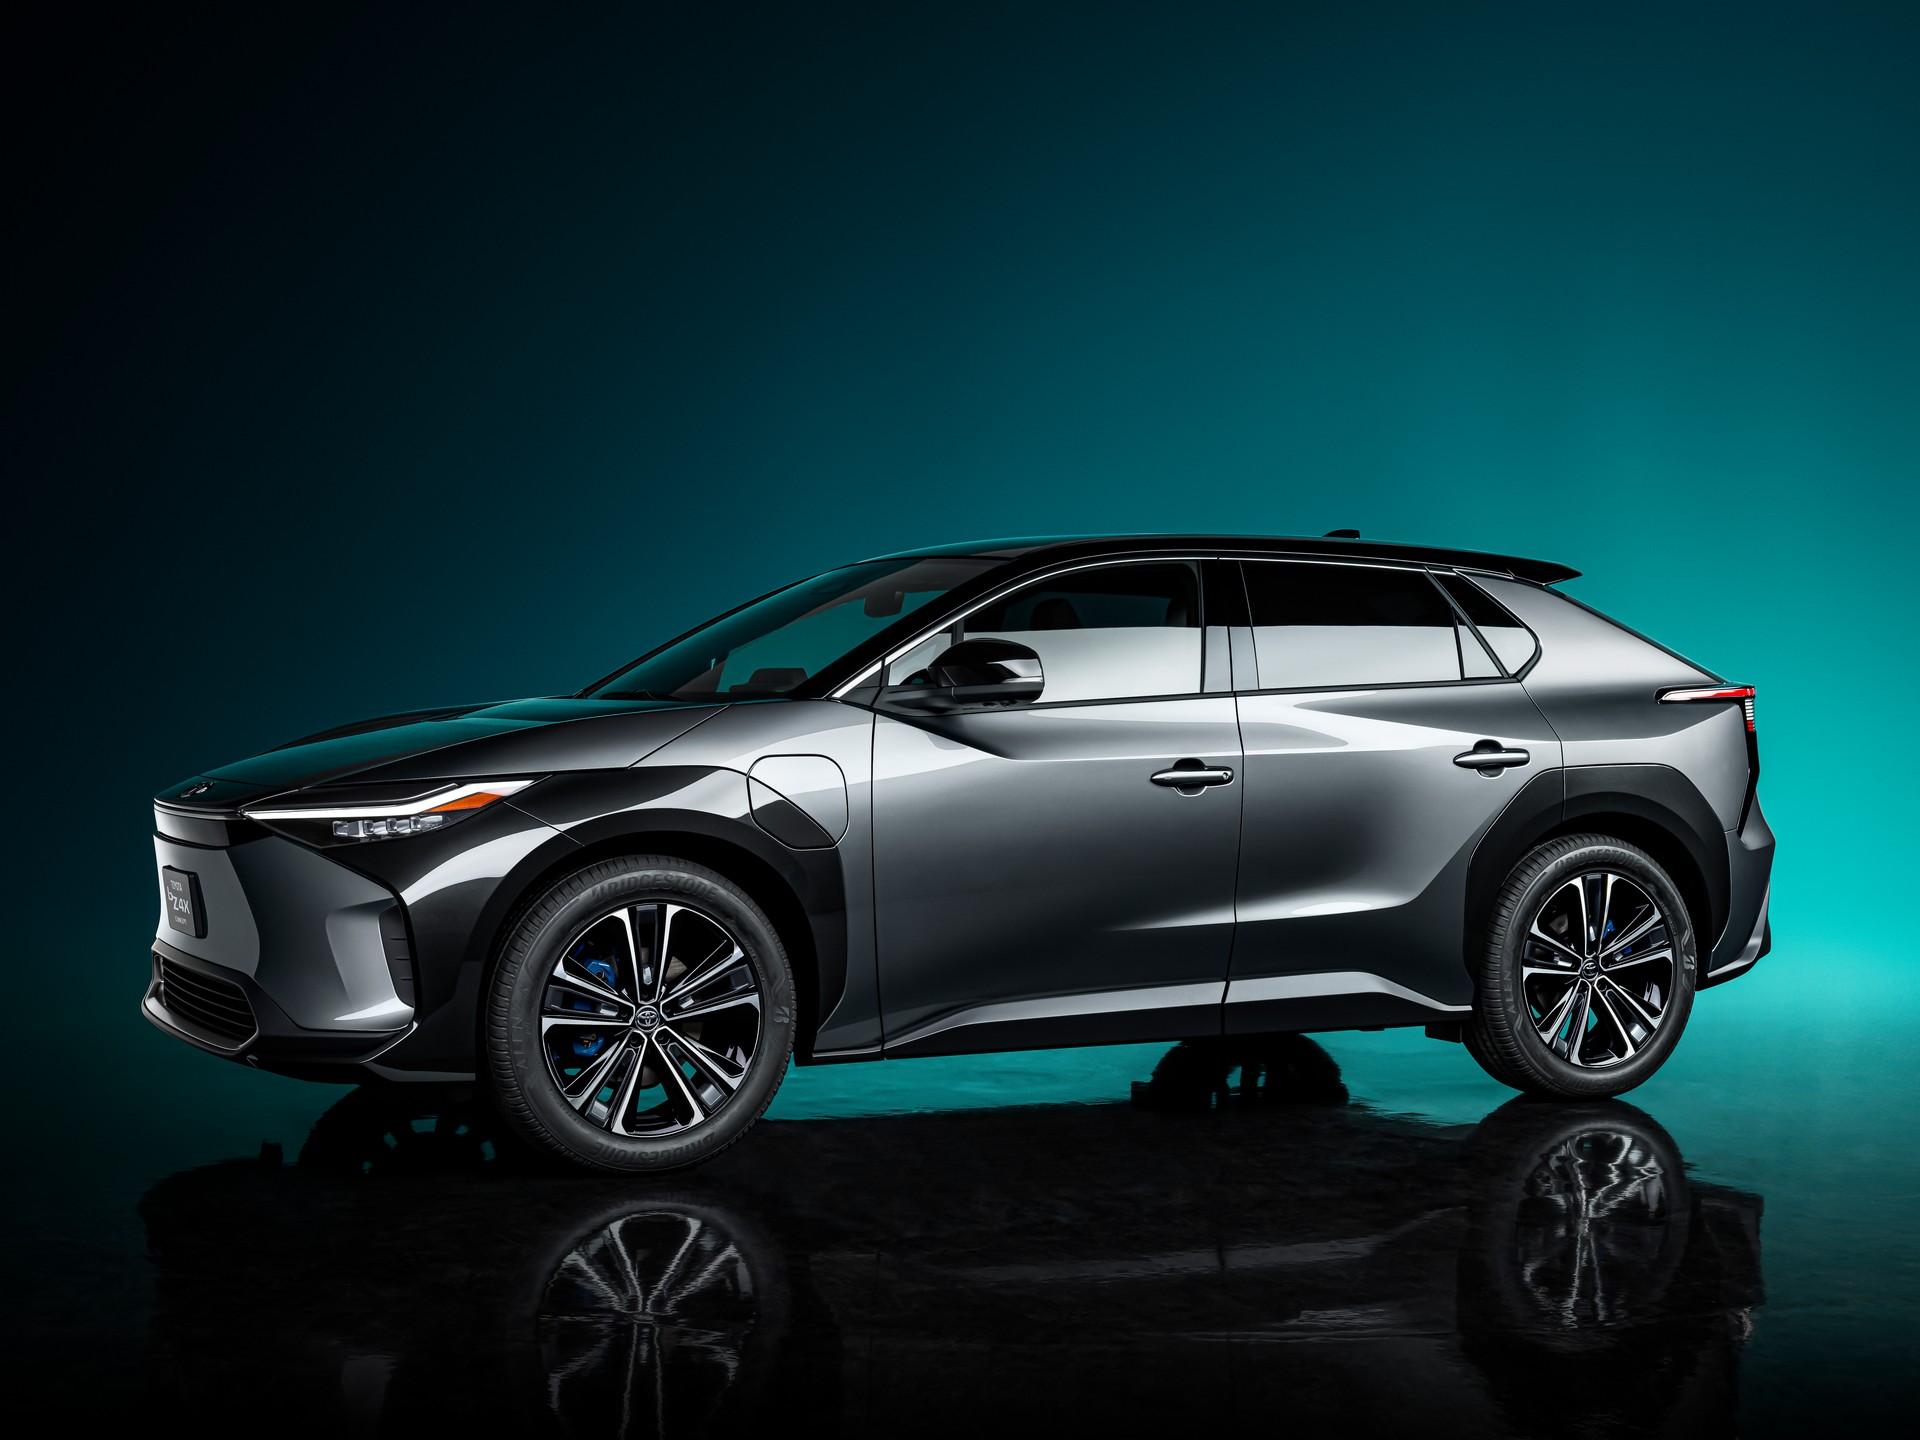 Toyota Luncurkan SUV Listik Pertama Bertajuk bZ4X!